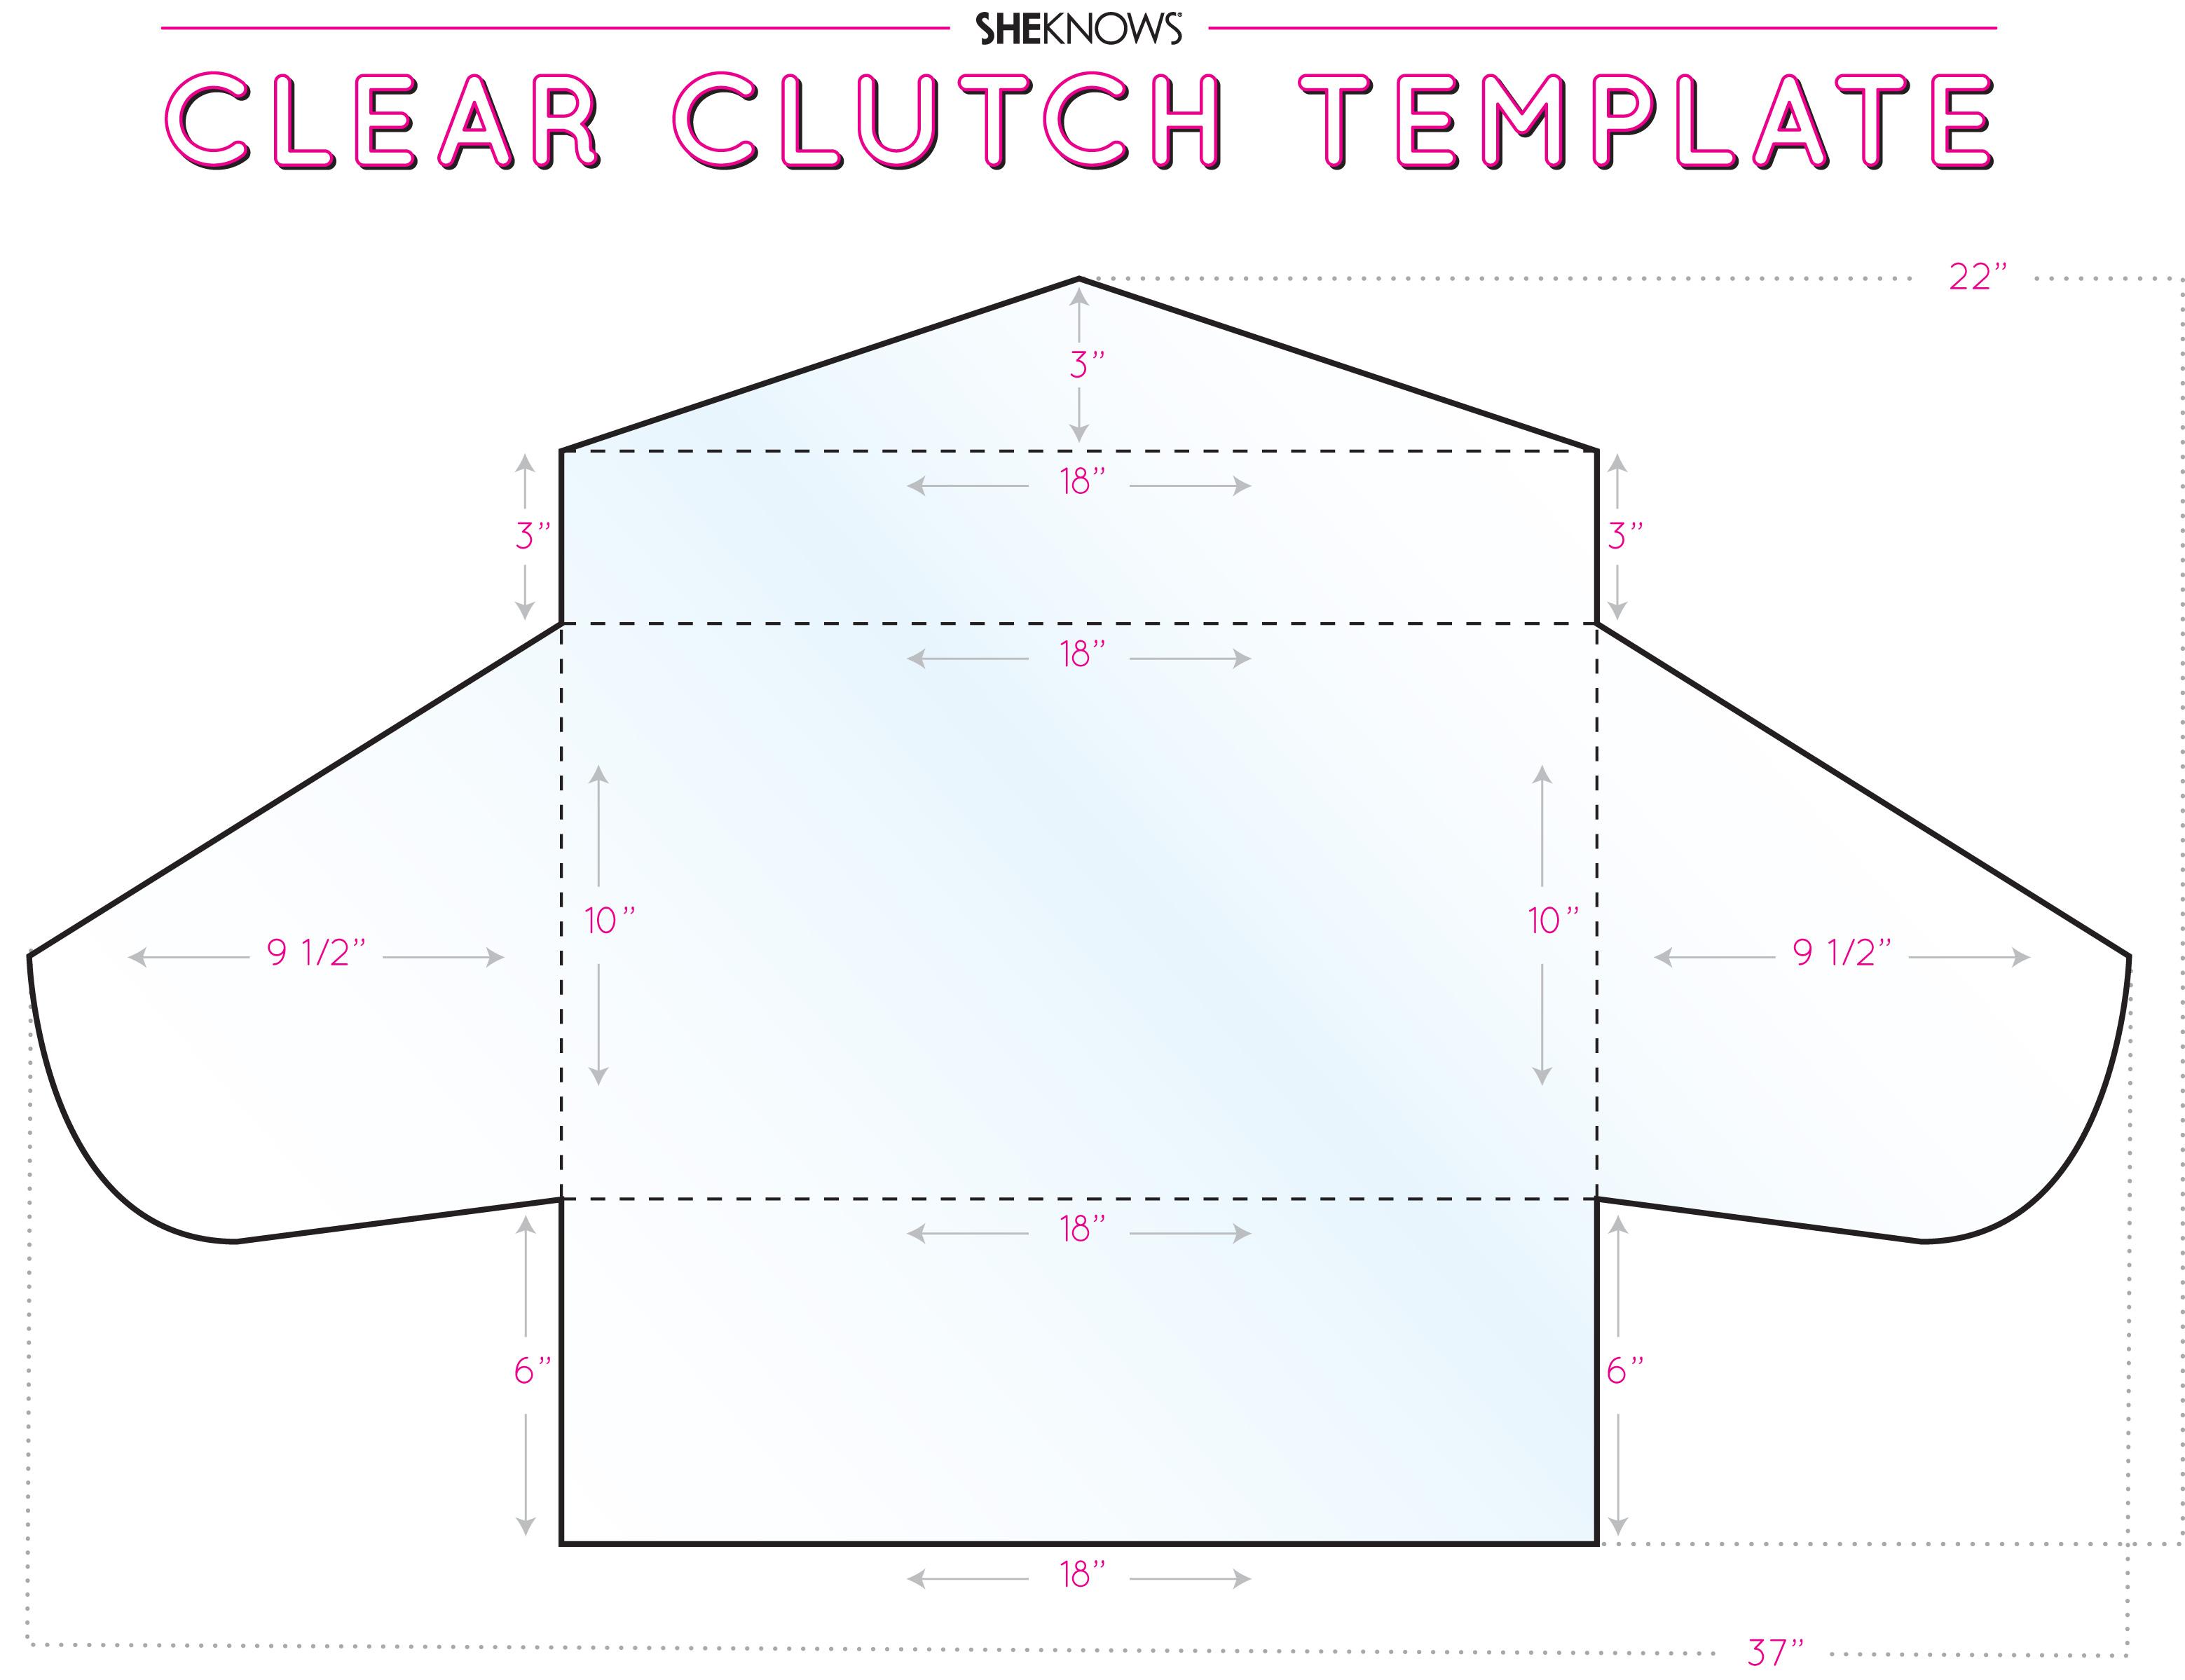 Clear vinyl clutch template